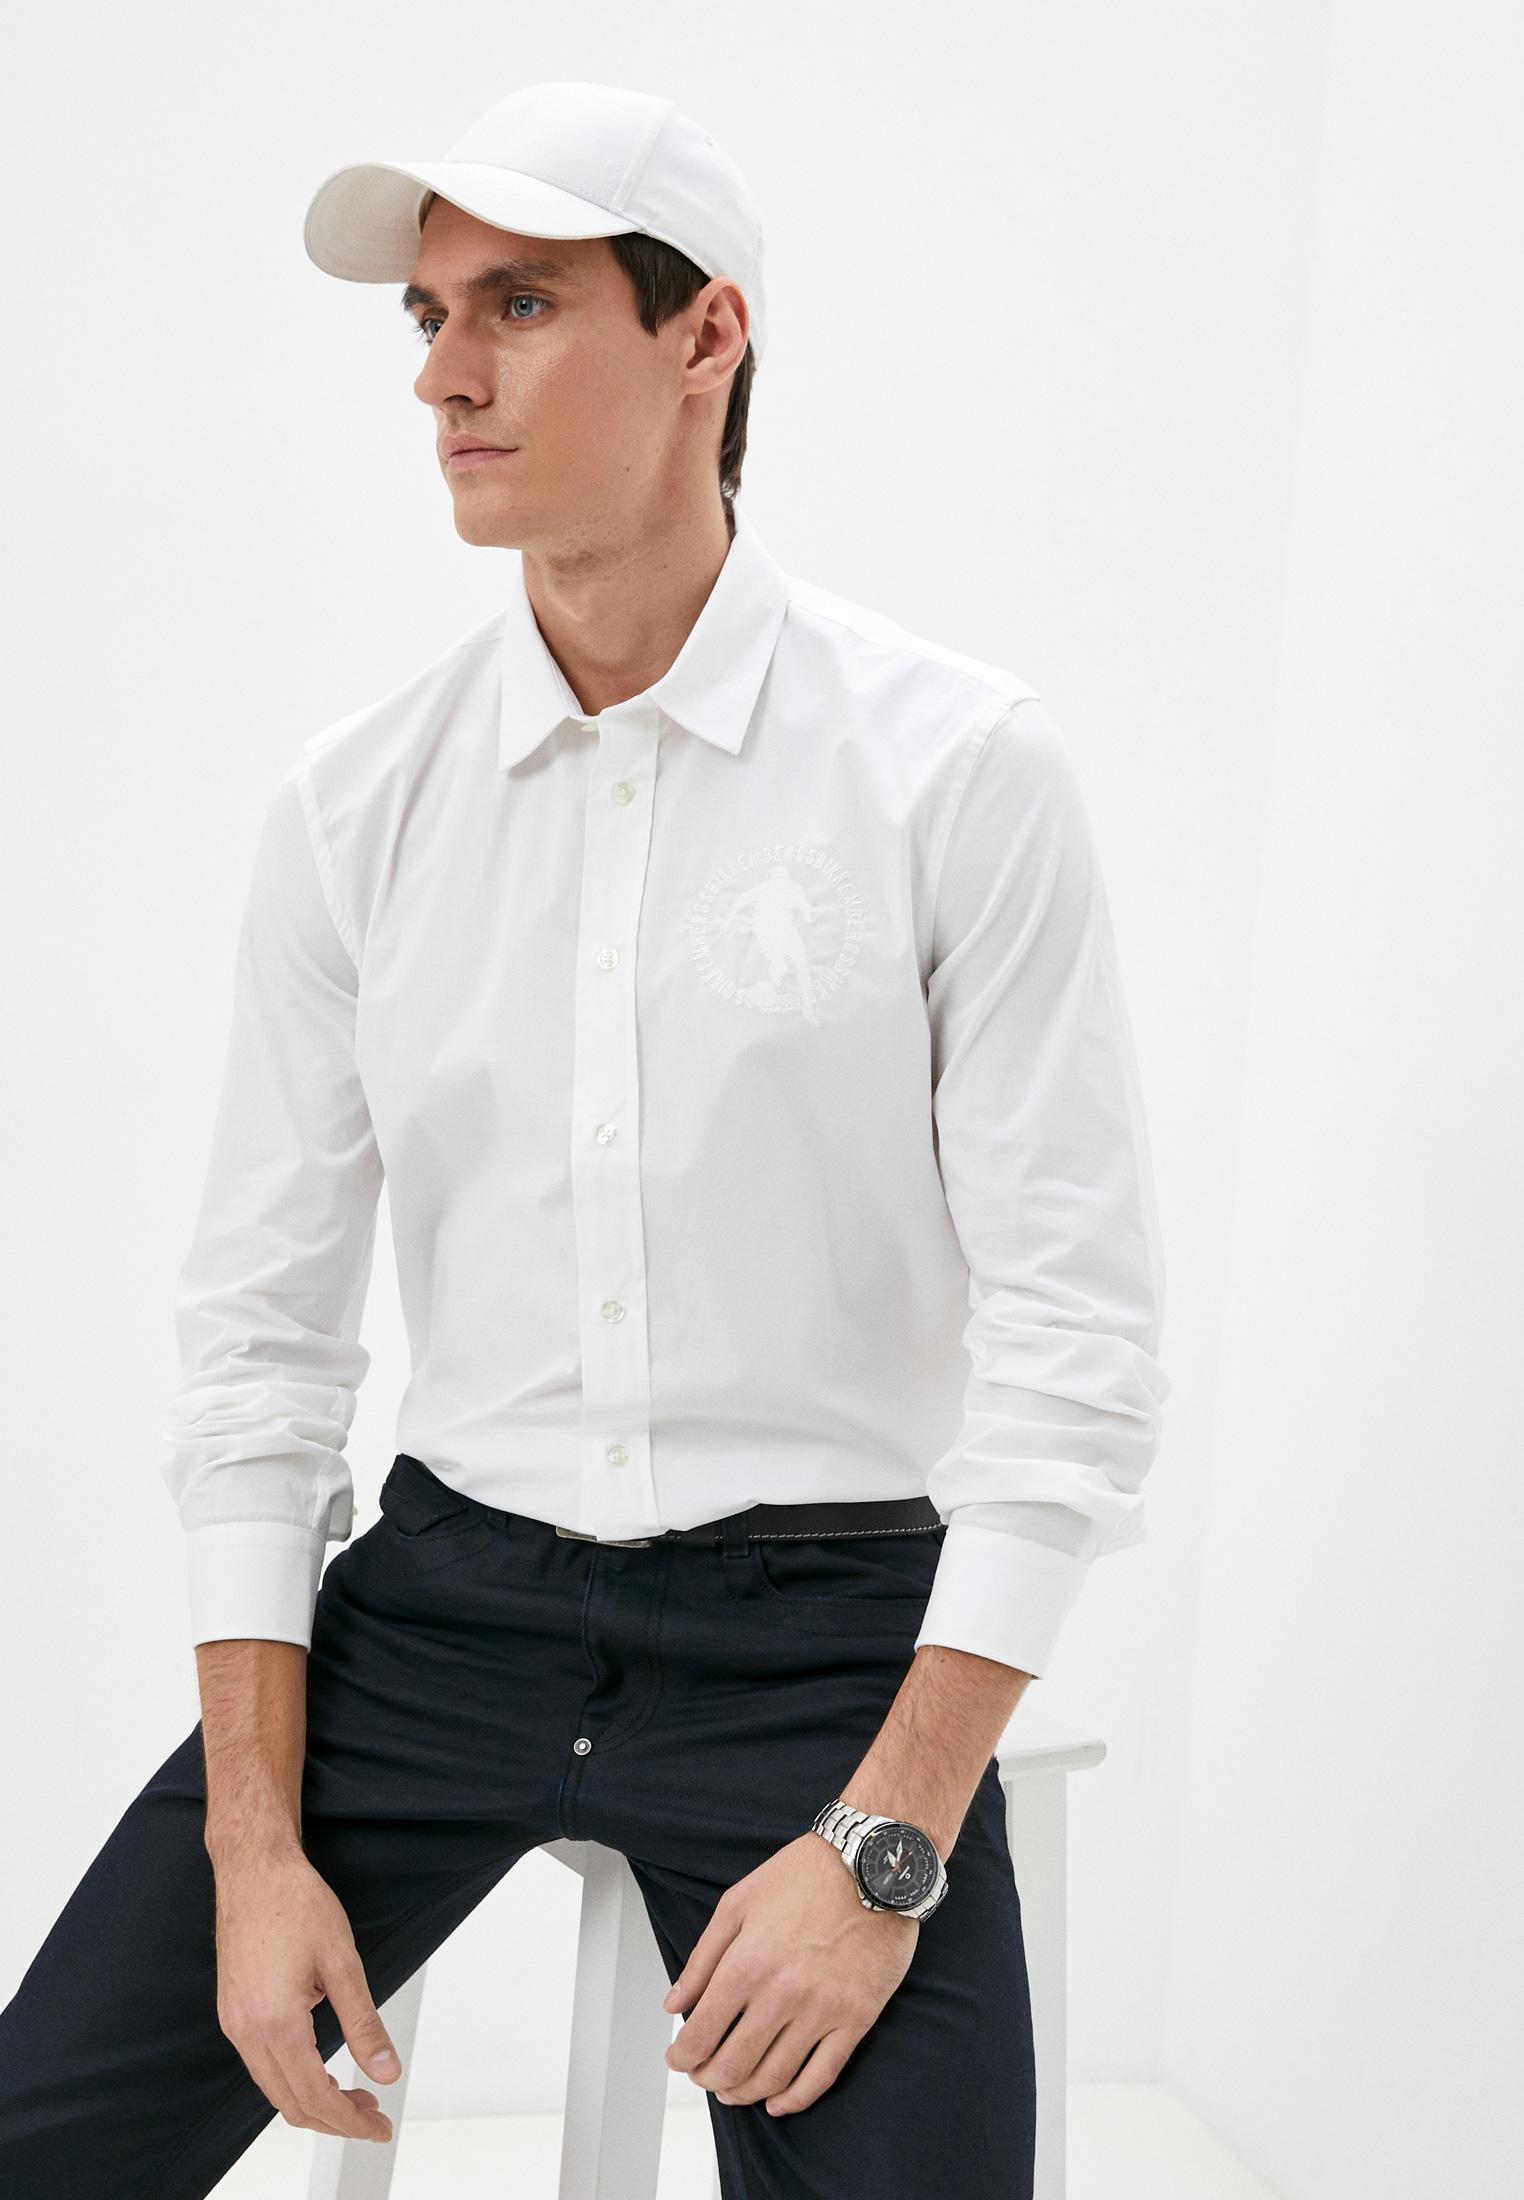 Рубашка с длинным рукавом Bikkembergs (Биккембергс) C C 009 2C S 2931: изображение 7